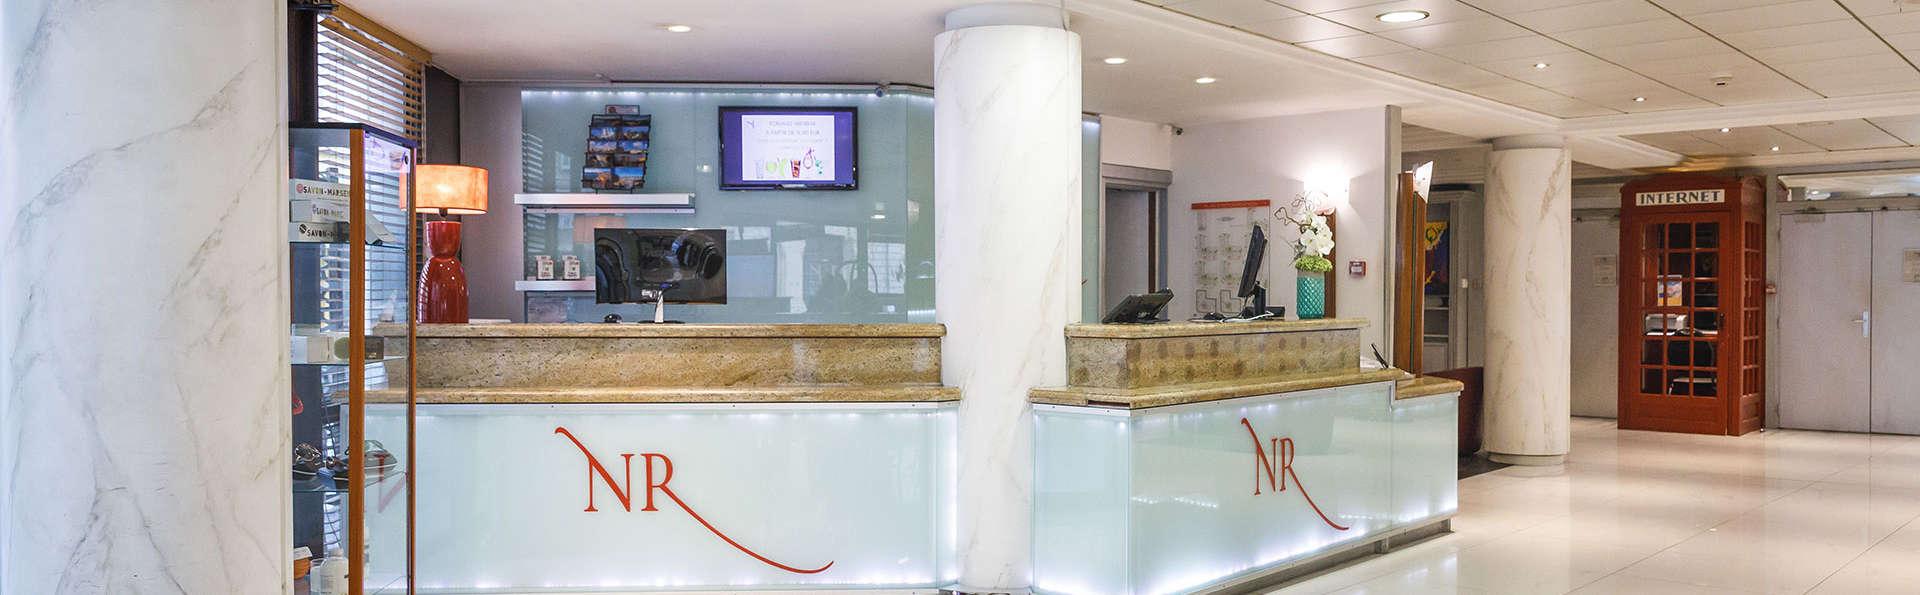 Hôtel Nice Riviera - EDIT_LOBBY_01.jpg